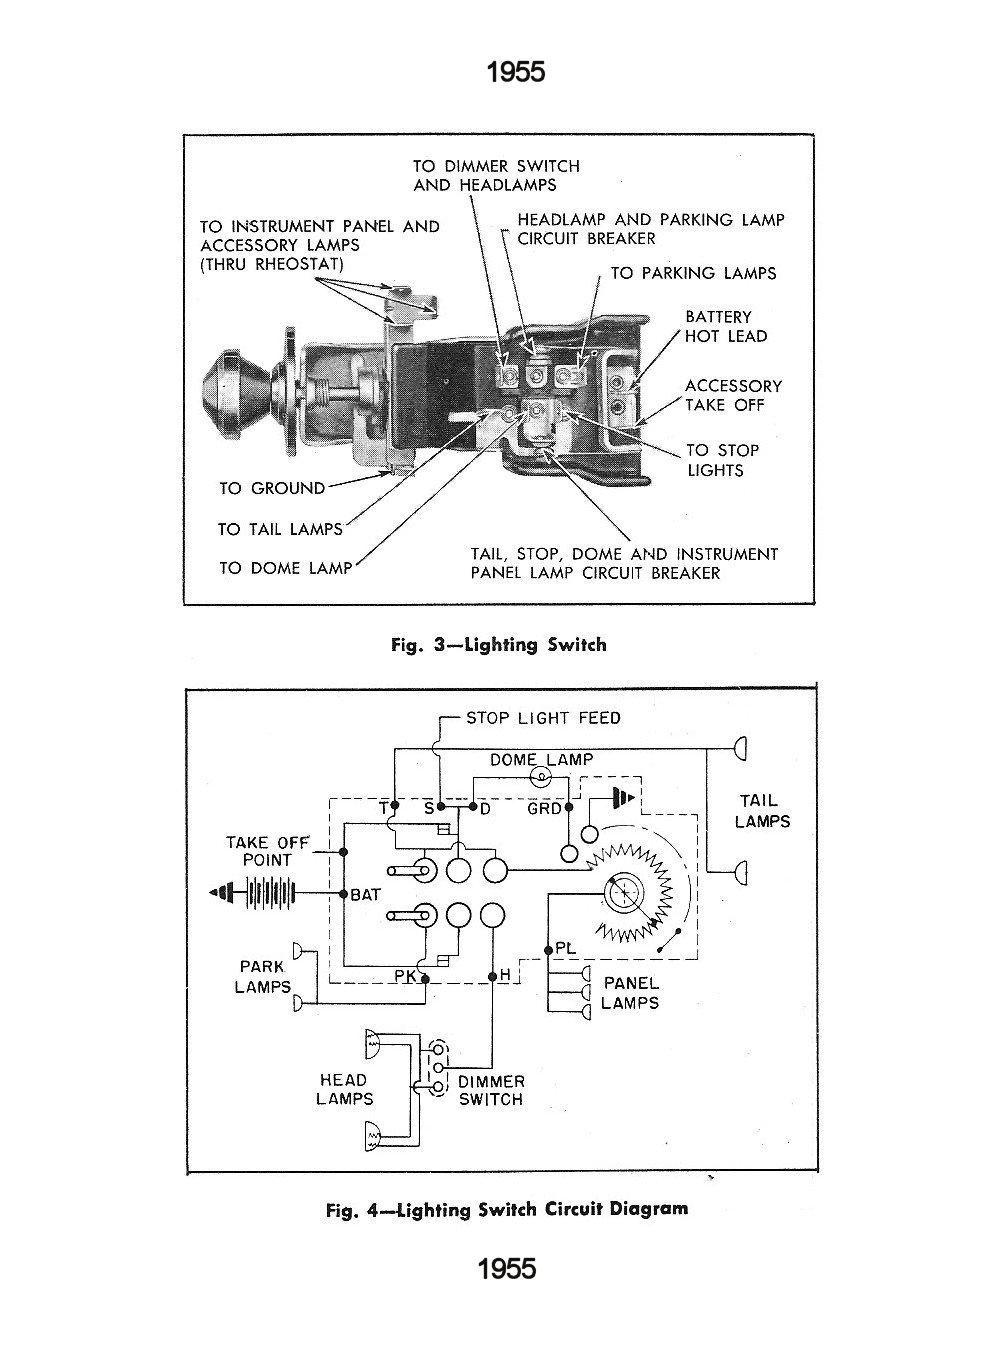 Painless Gm Headlight Switch Wiring Diagram | Wiring Diagram - Gm Headlight Switch Wiring Diagram